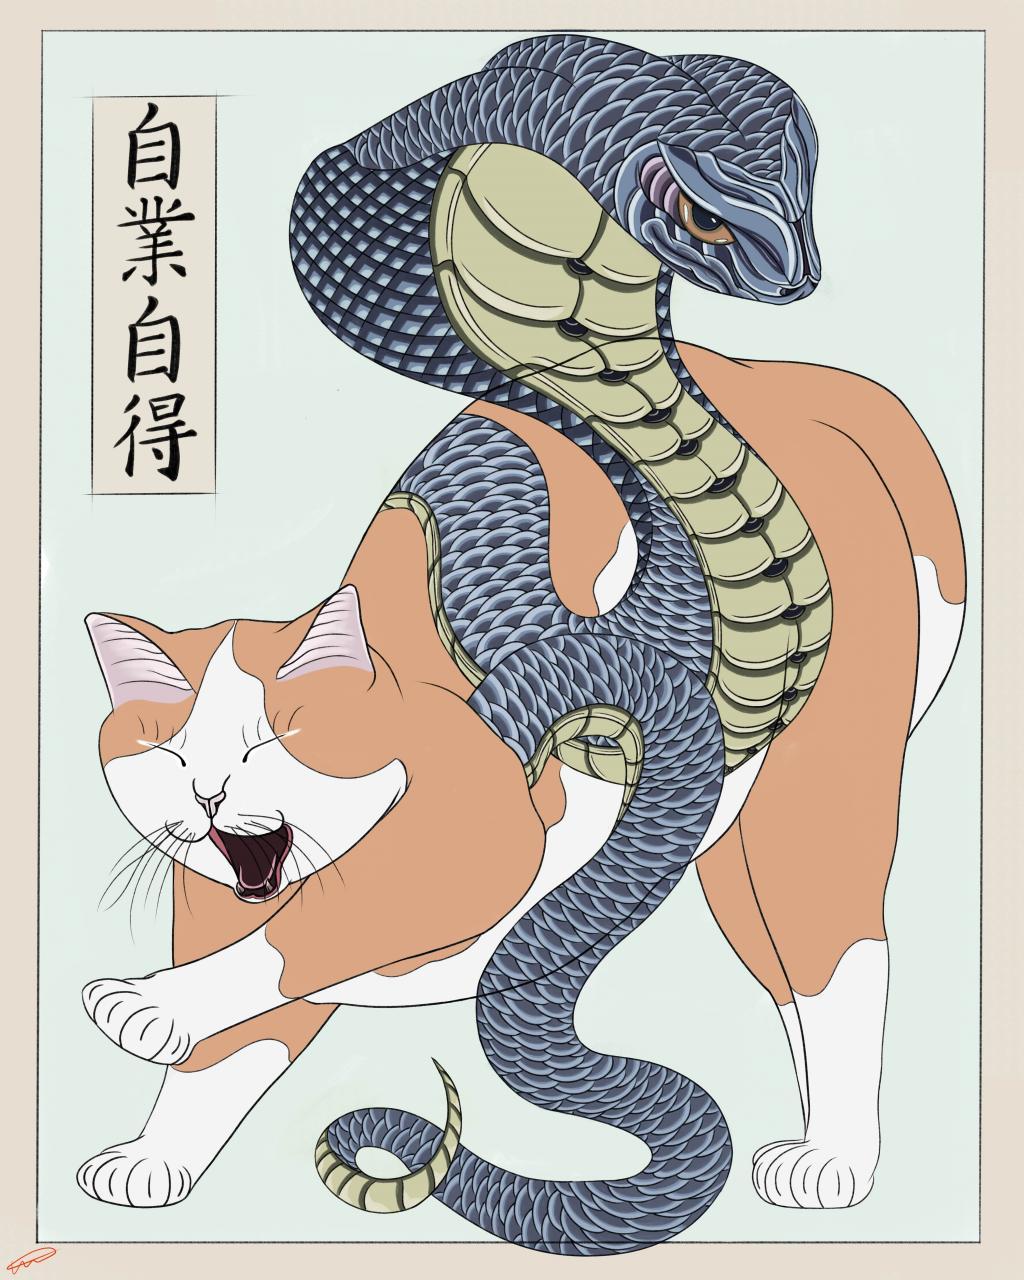 Jigoujitoku, my new monmon cat design